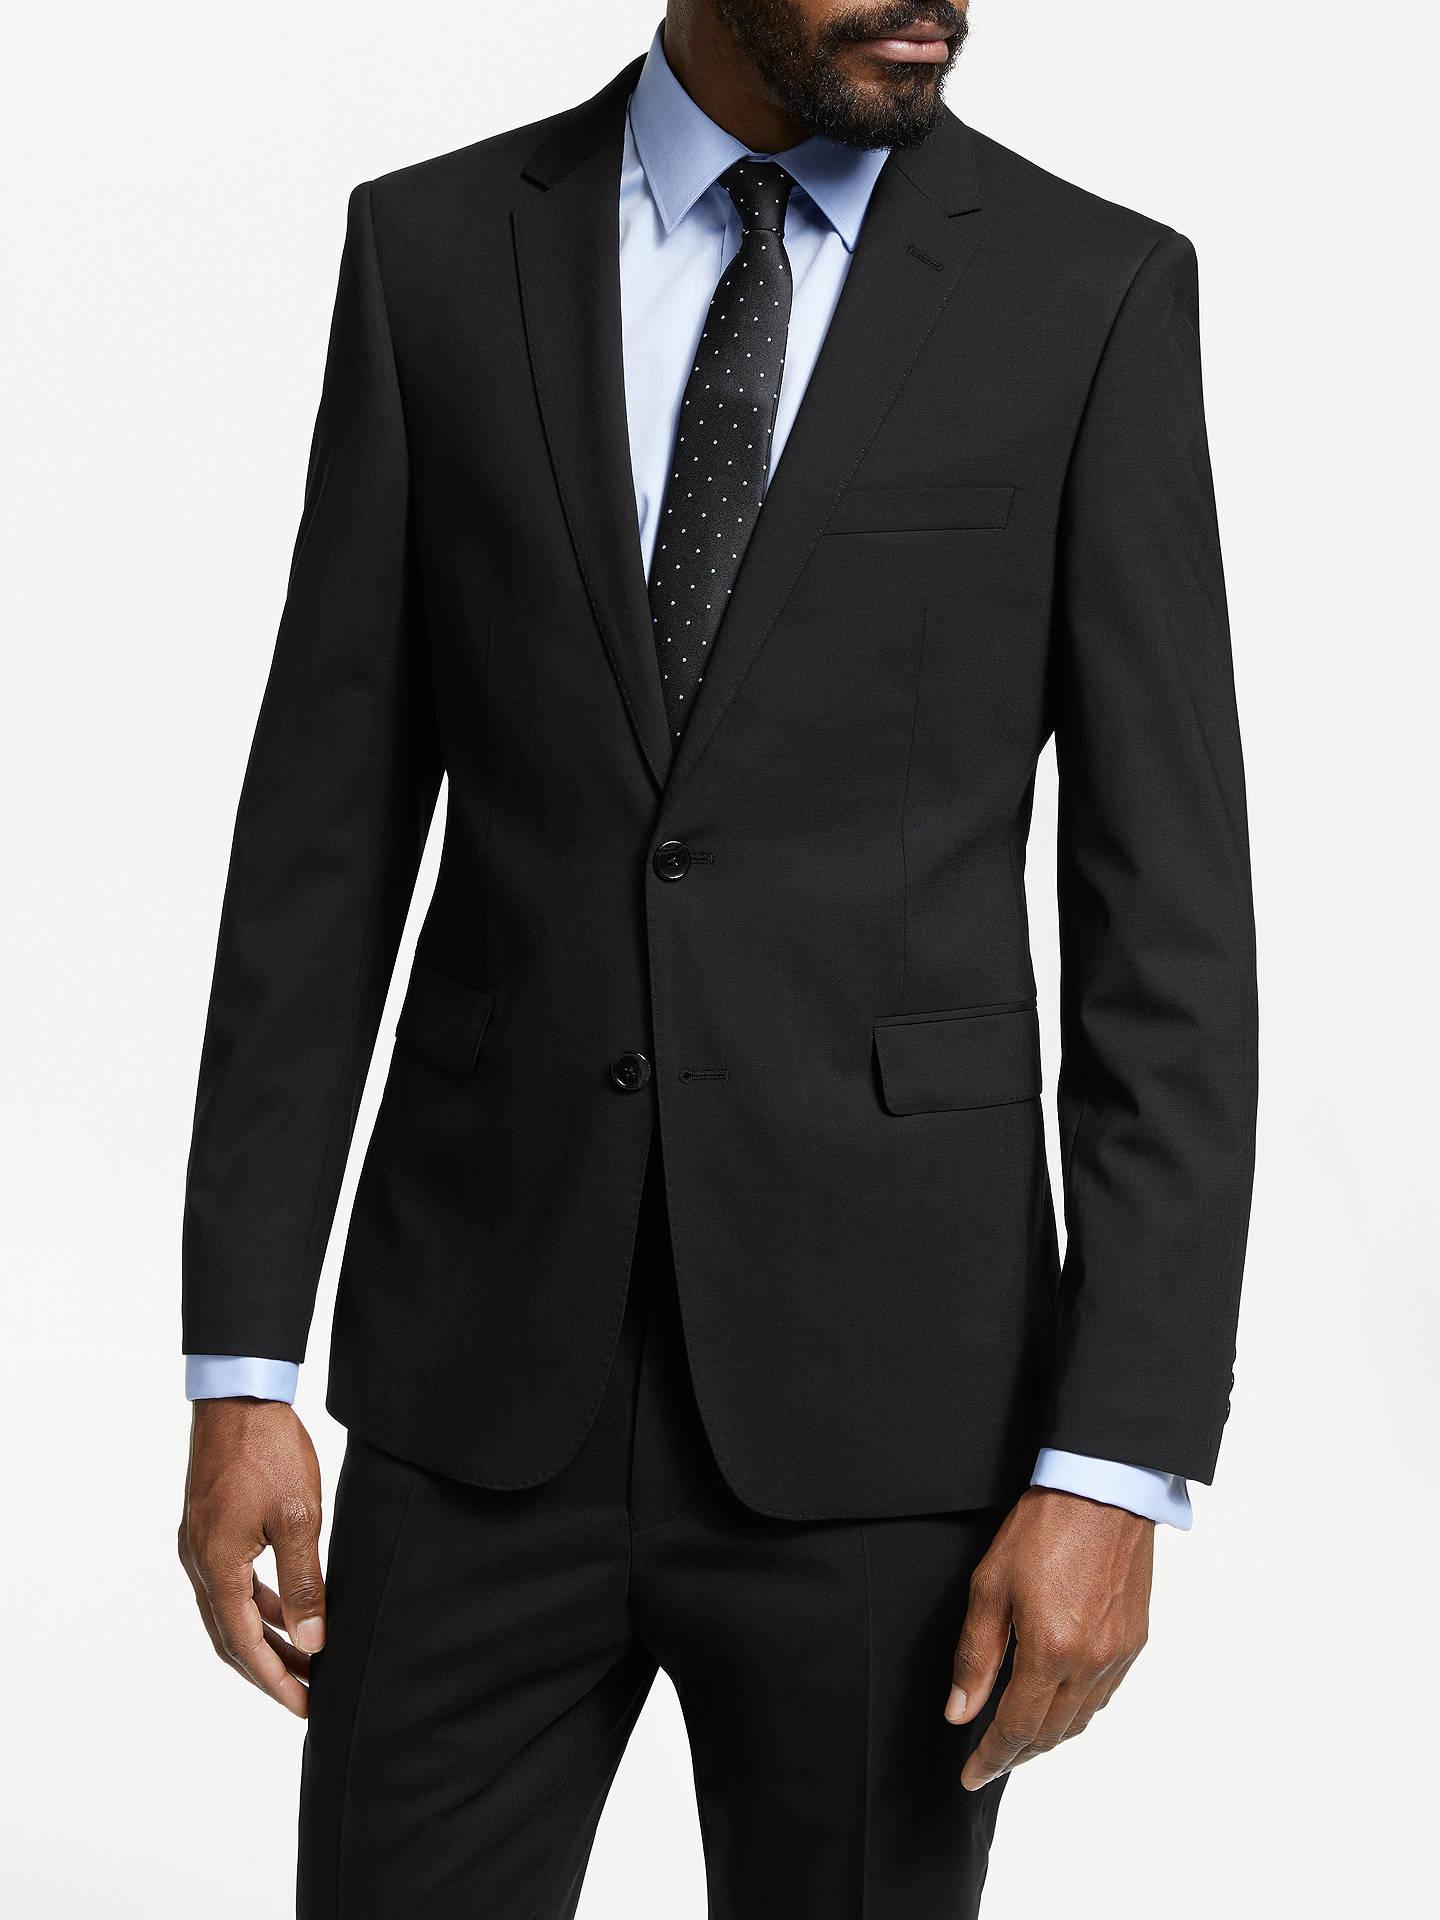 b48ce6debbf5 Buy John Lewis   Partners Plain Slim Fit Suit Jacket